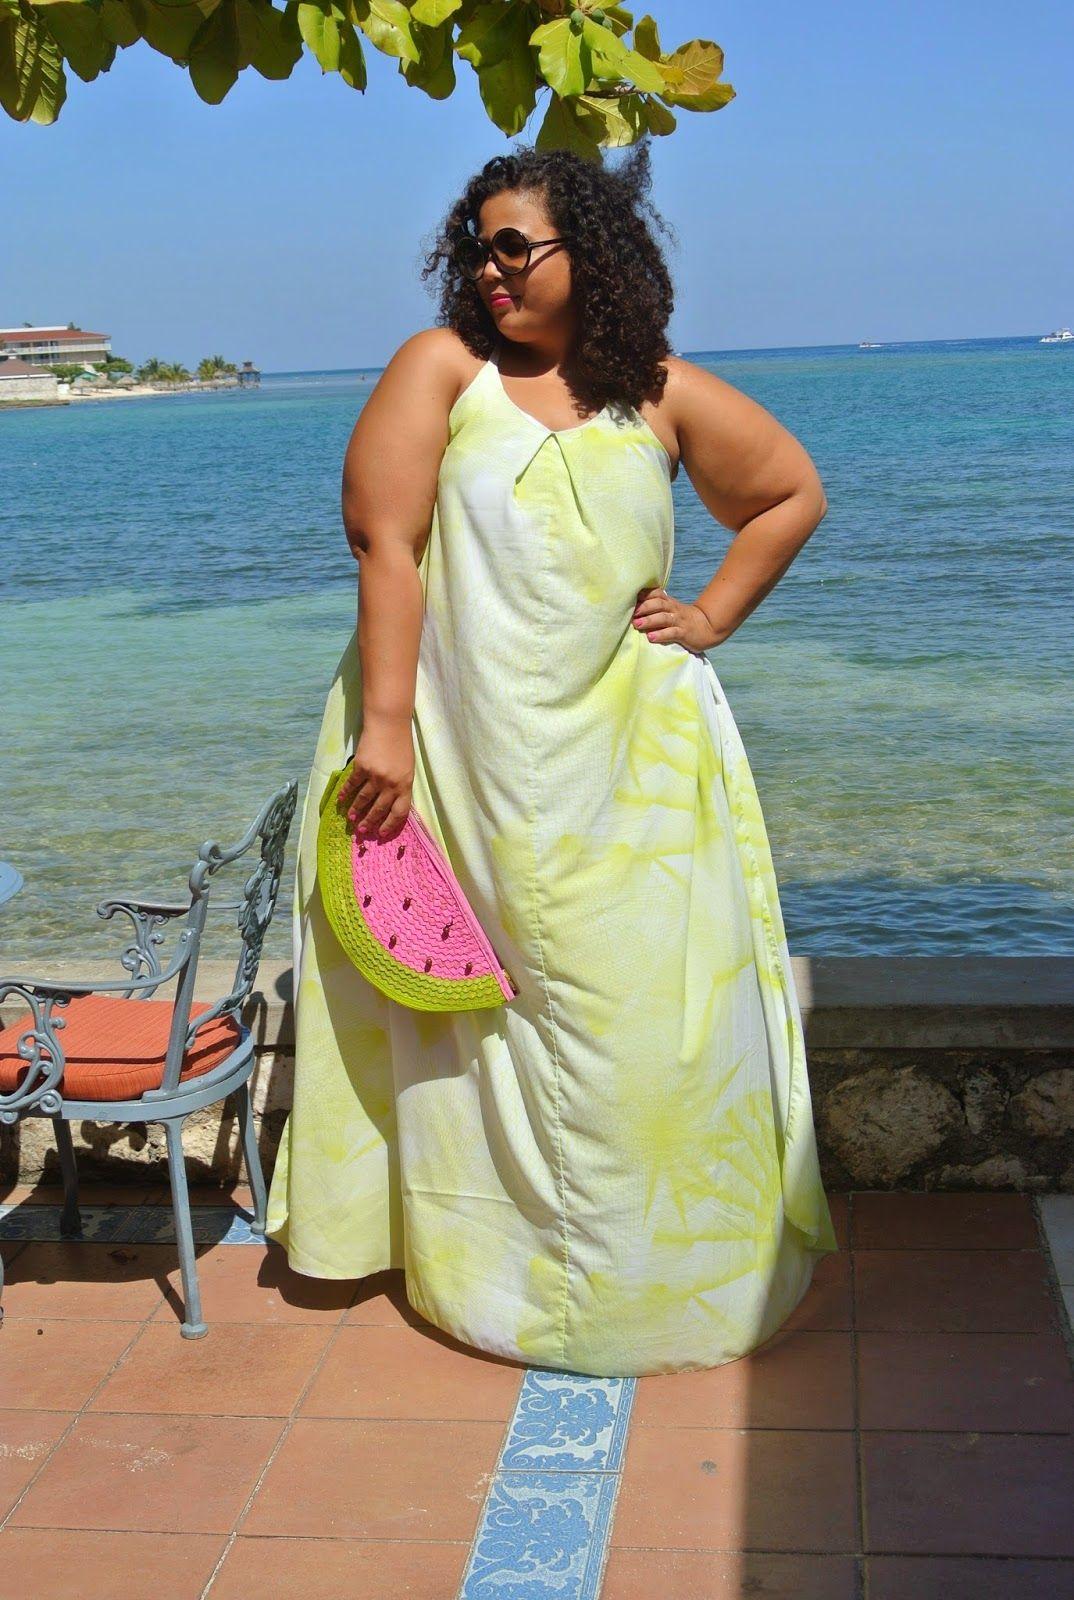 Plus Size Resortwear Halfmoon Bay Jamaica Fashion Plus